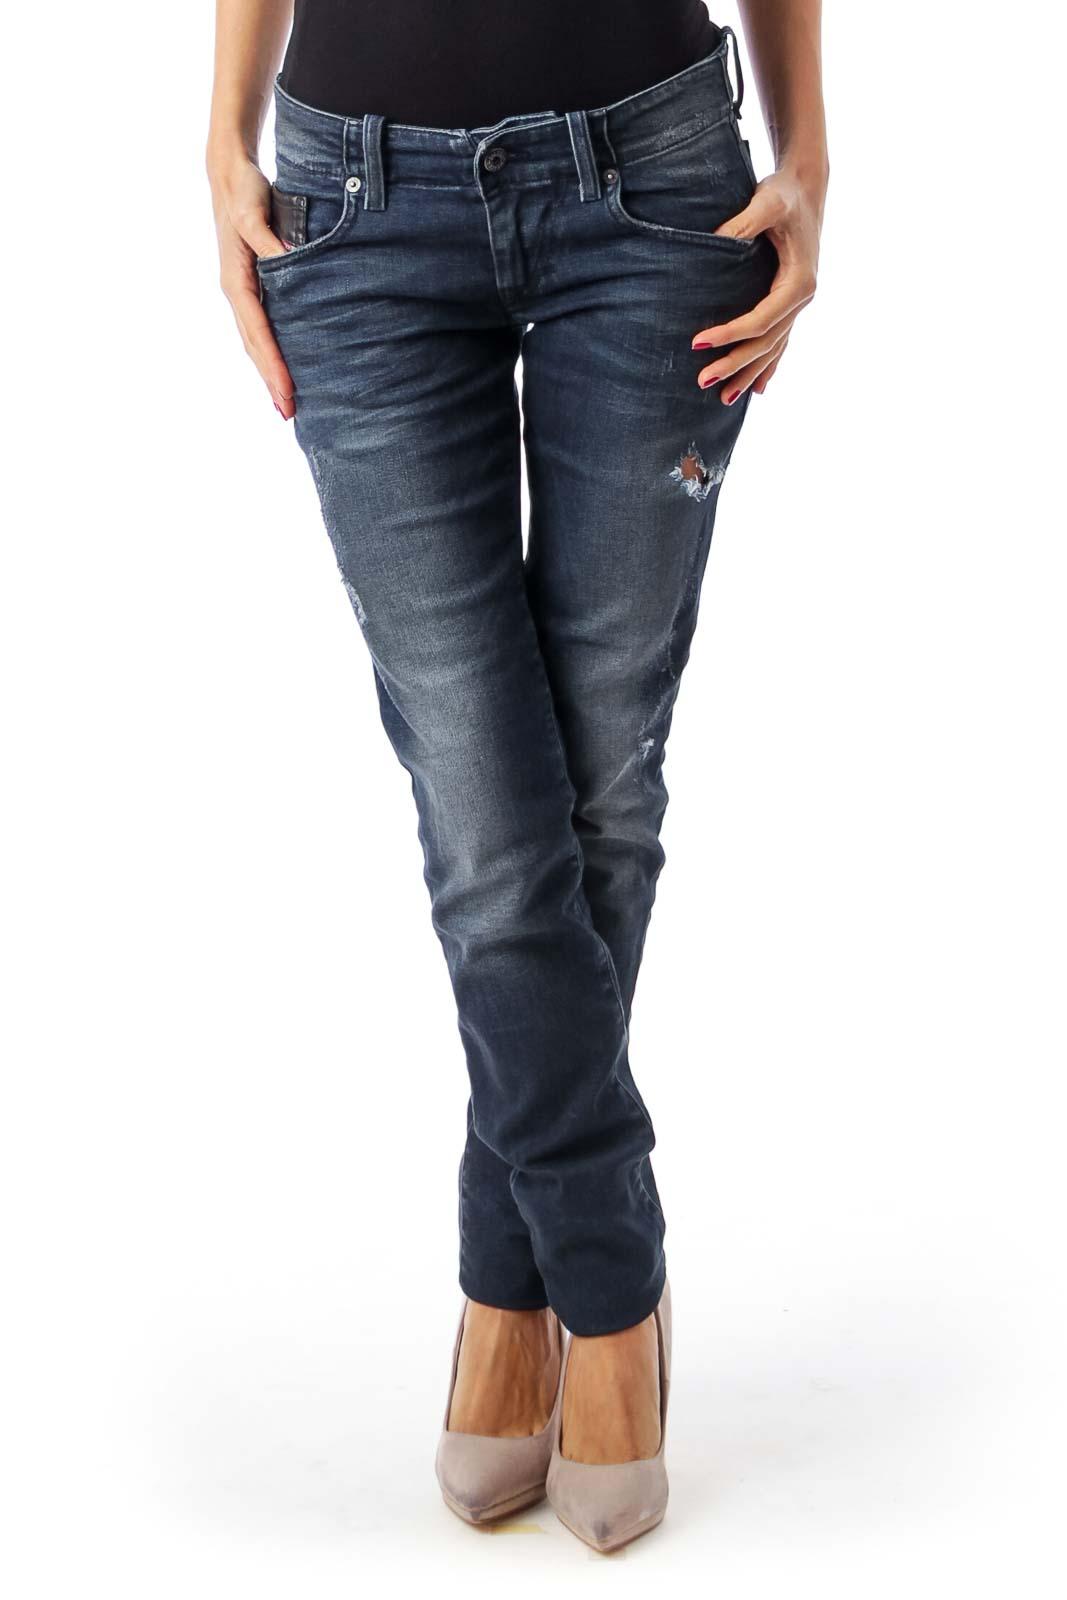 Deep Blue Slim Skinny Jeans Front